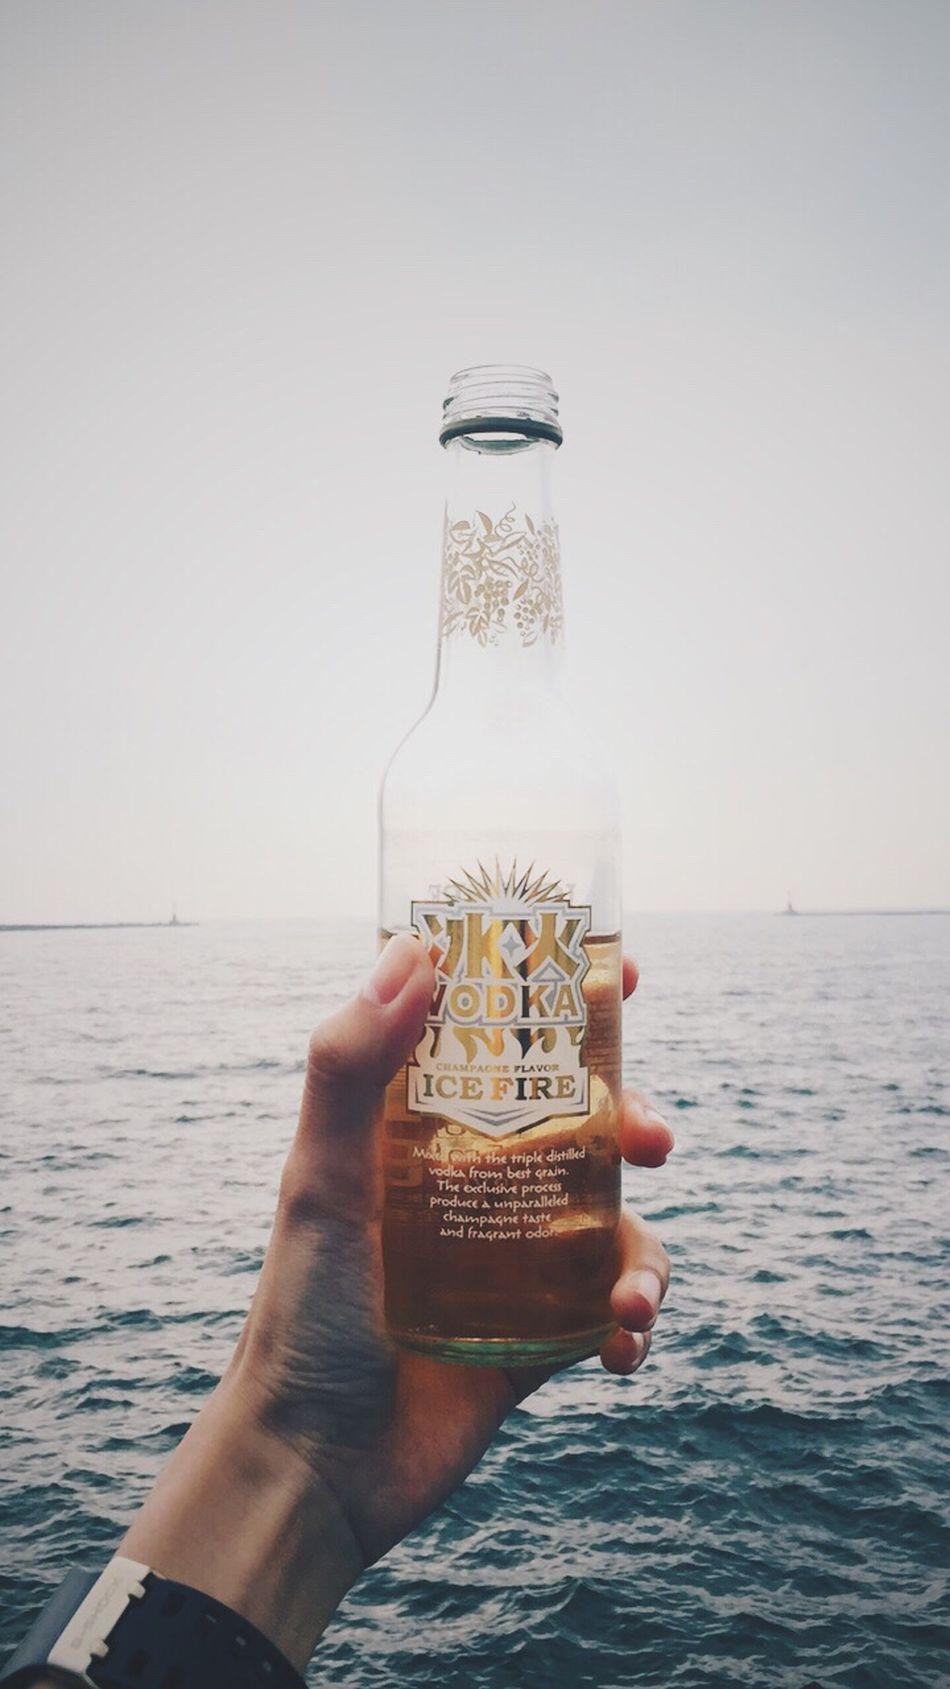 Drink by the beach. ❤️ Beach Champagne Sea Ocean Vodka🍹 Relax 西子灣 Taiwan Ice Fire